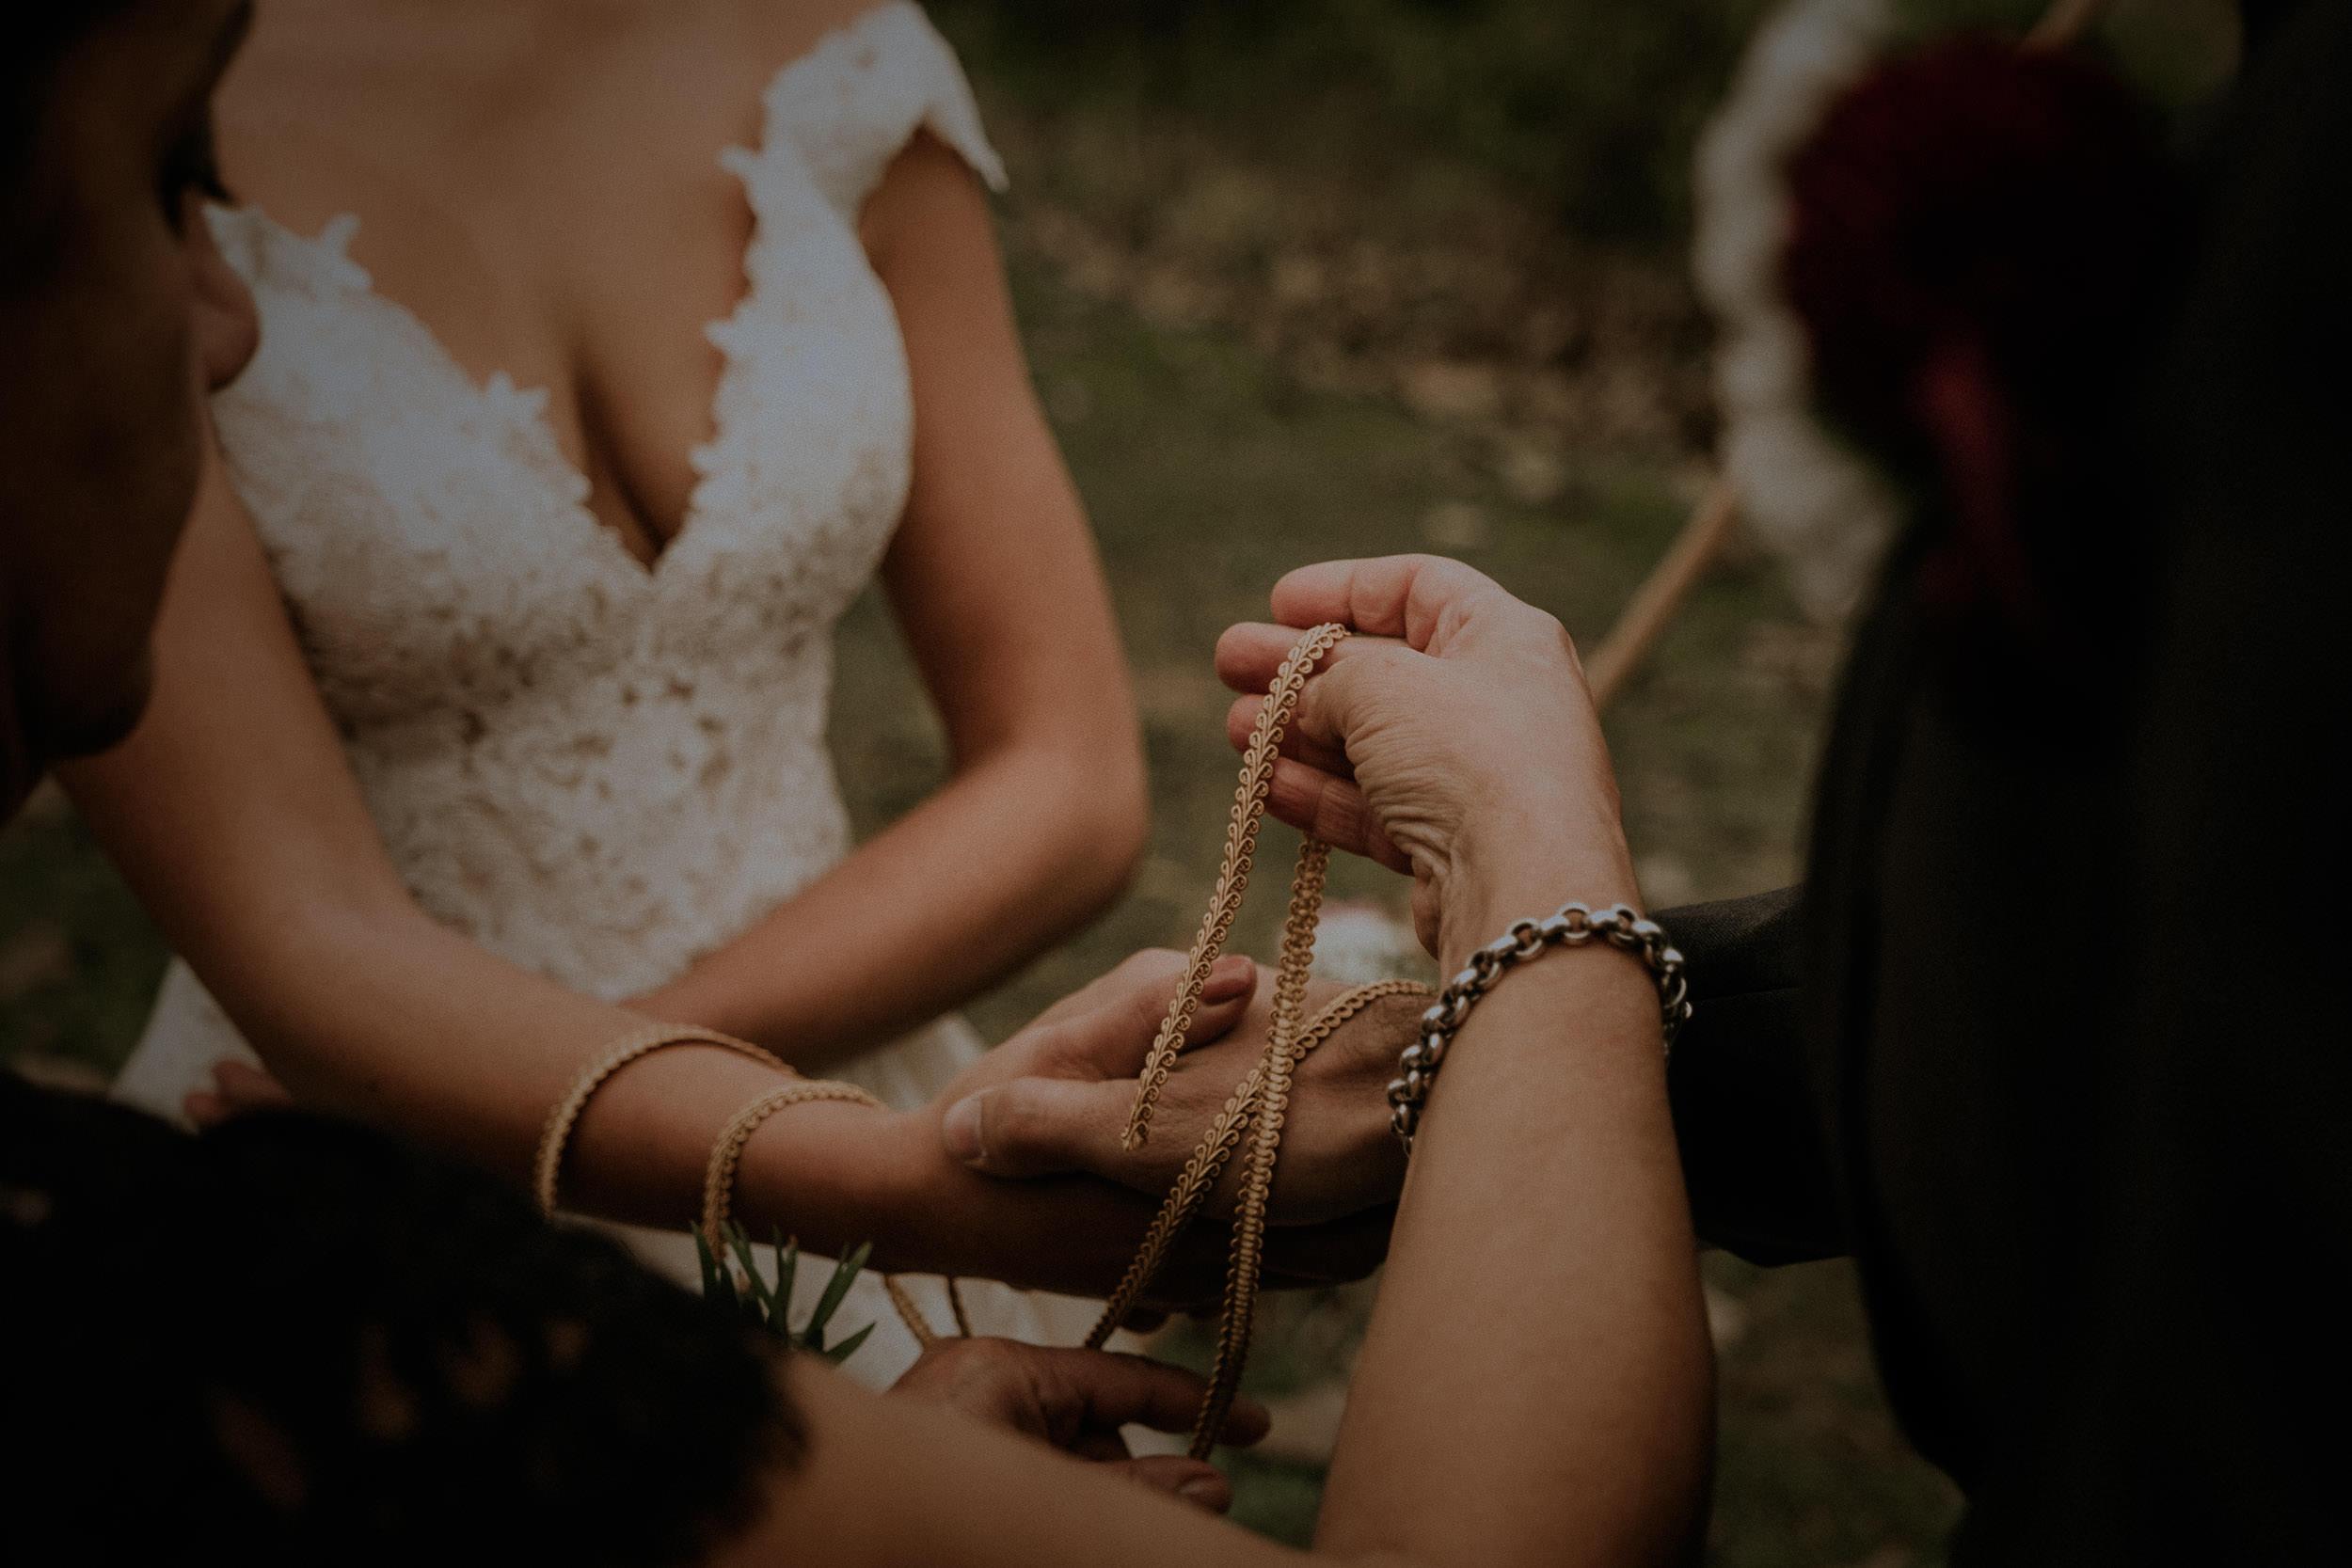 g_c wedding - kings _ thieves elopement wedding photography - blog 32.jpg